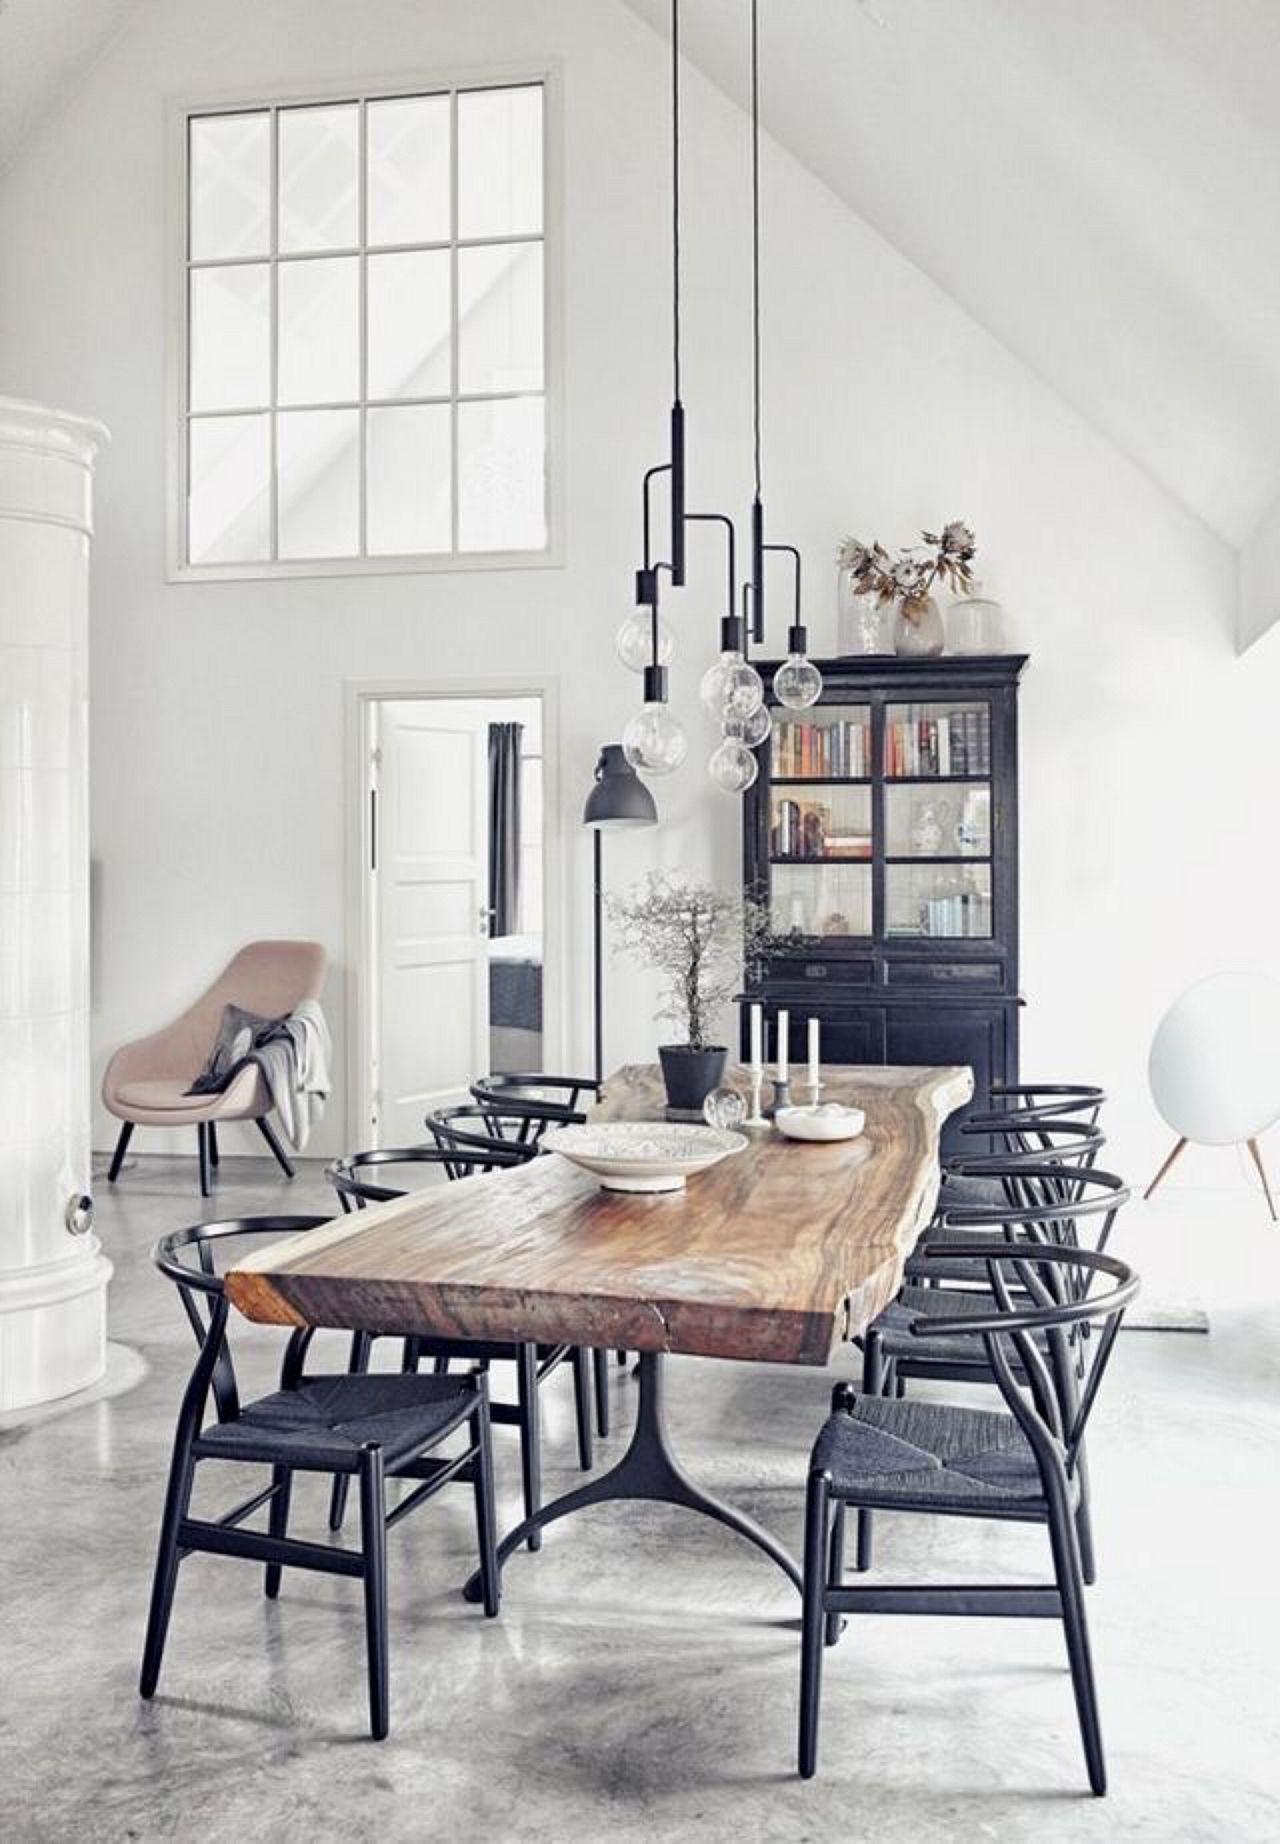 Modern interior design ideas for your home renovation decor